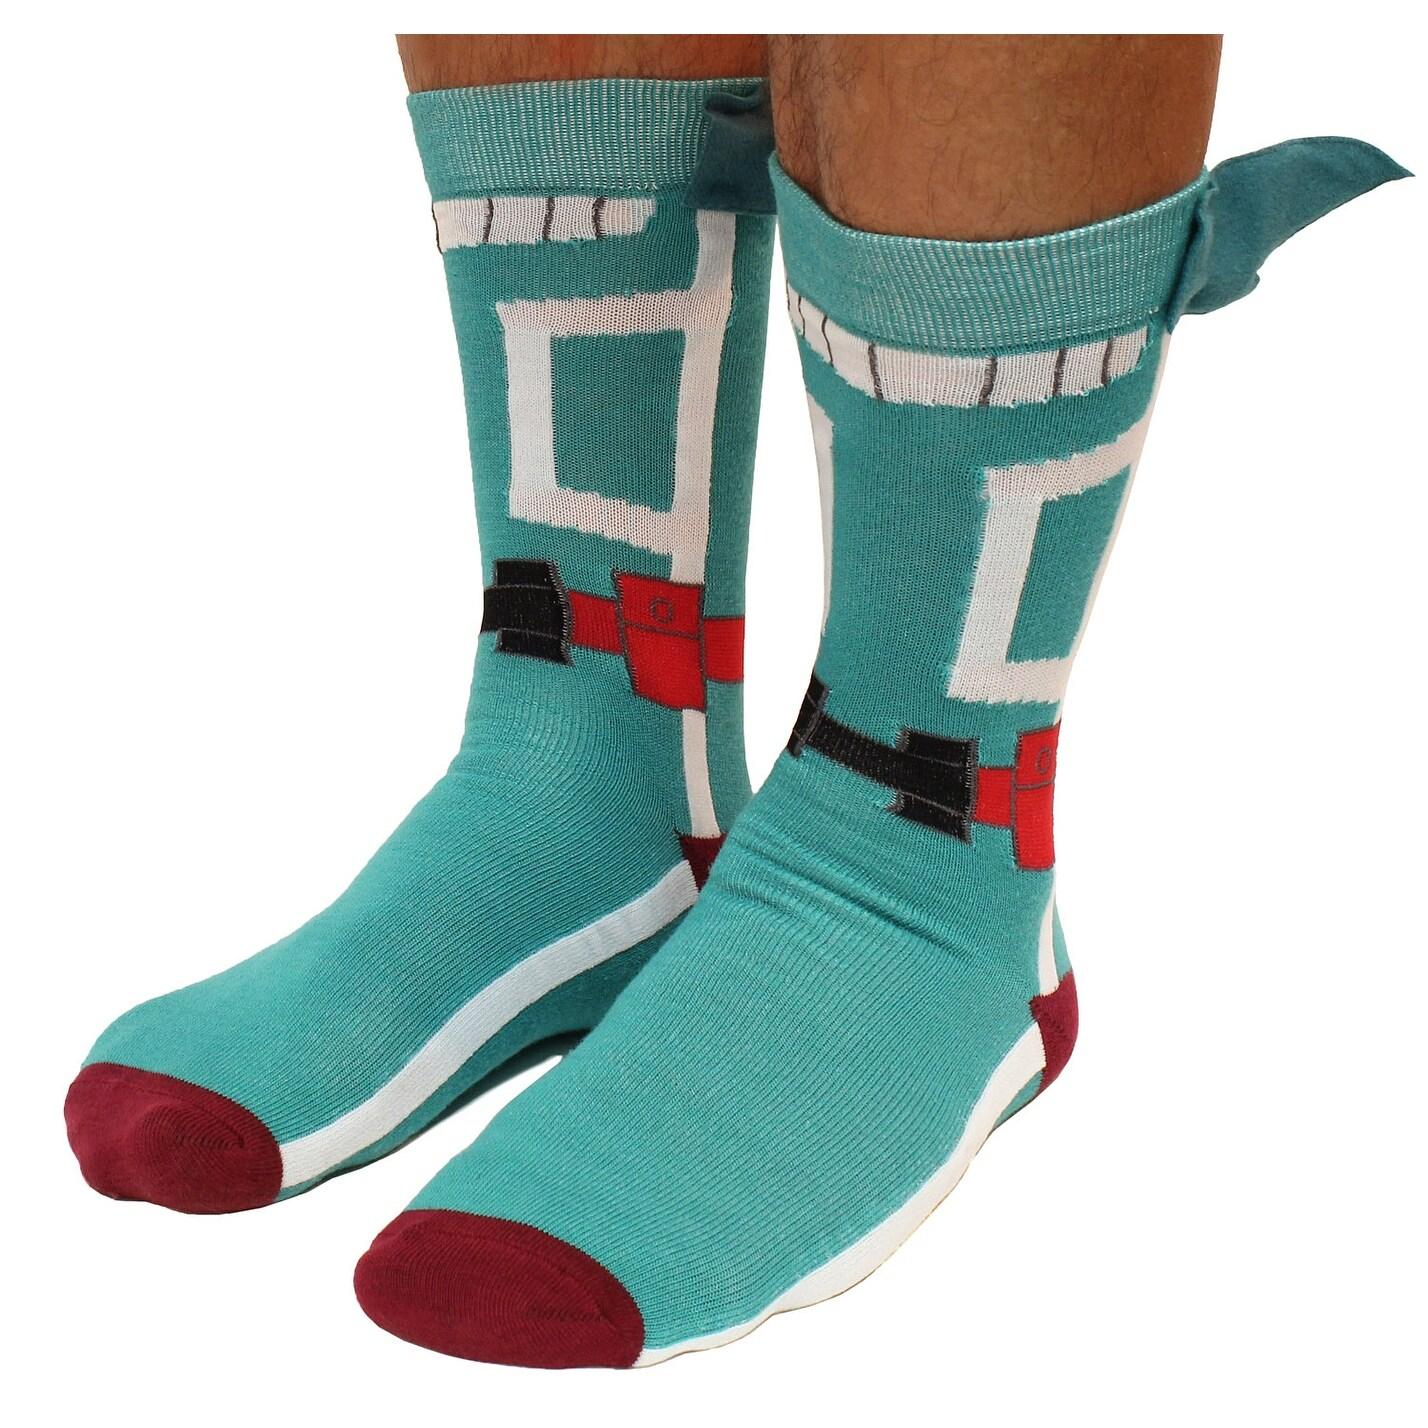 51844eb0b Shop My Hero Academia Socks Crew Costume Cosplay Izuku Deku Midoriya - On  Sale - Ships To Canada - Overstock - 23547709